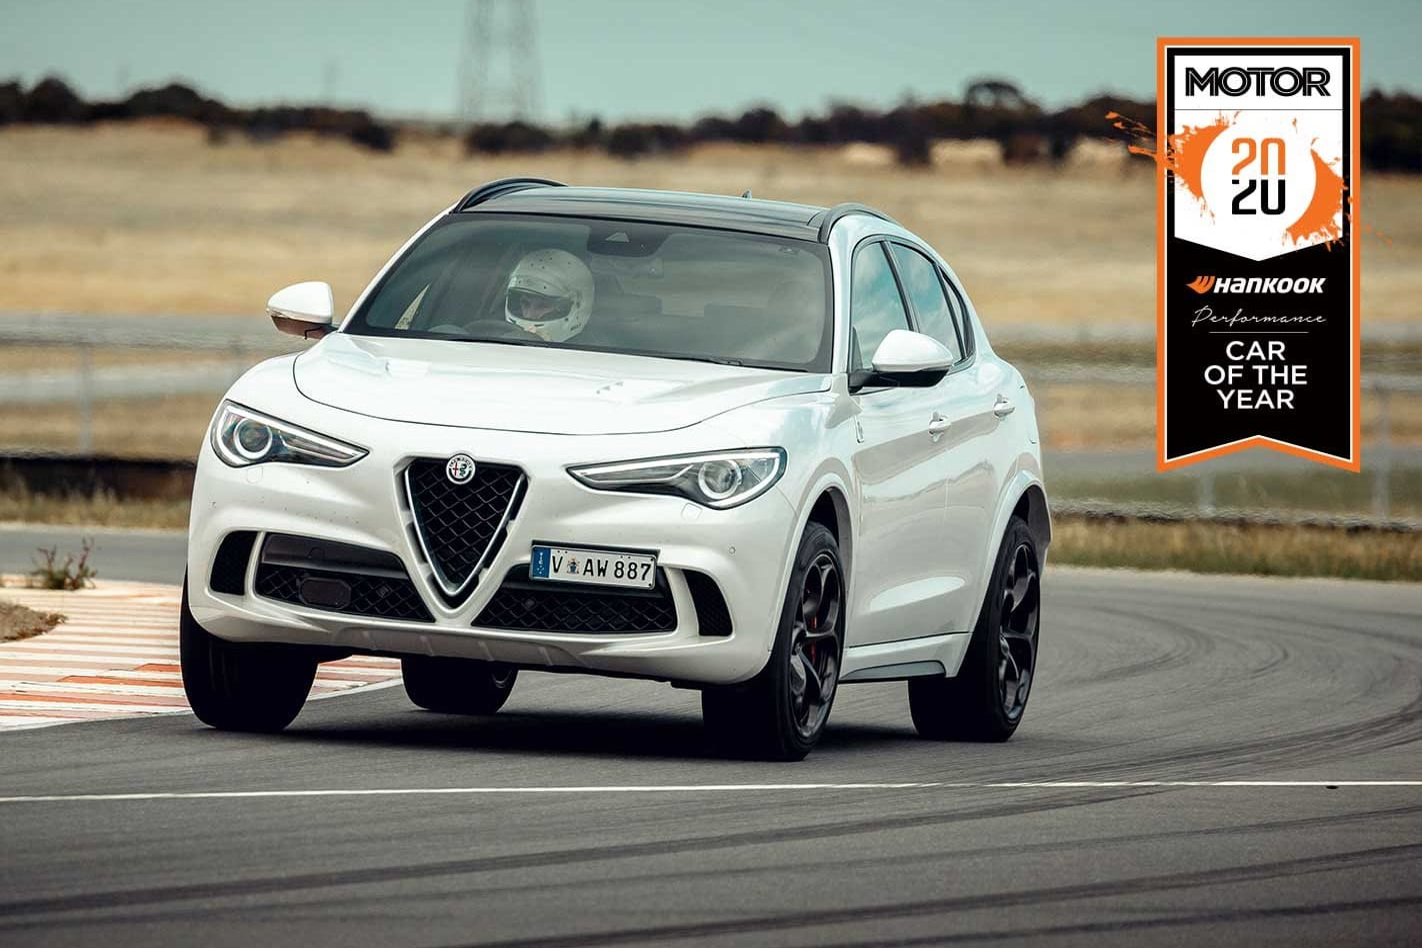 Alfa Romeo Stelvio Q Performance Car of the Year 2020 results